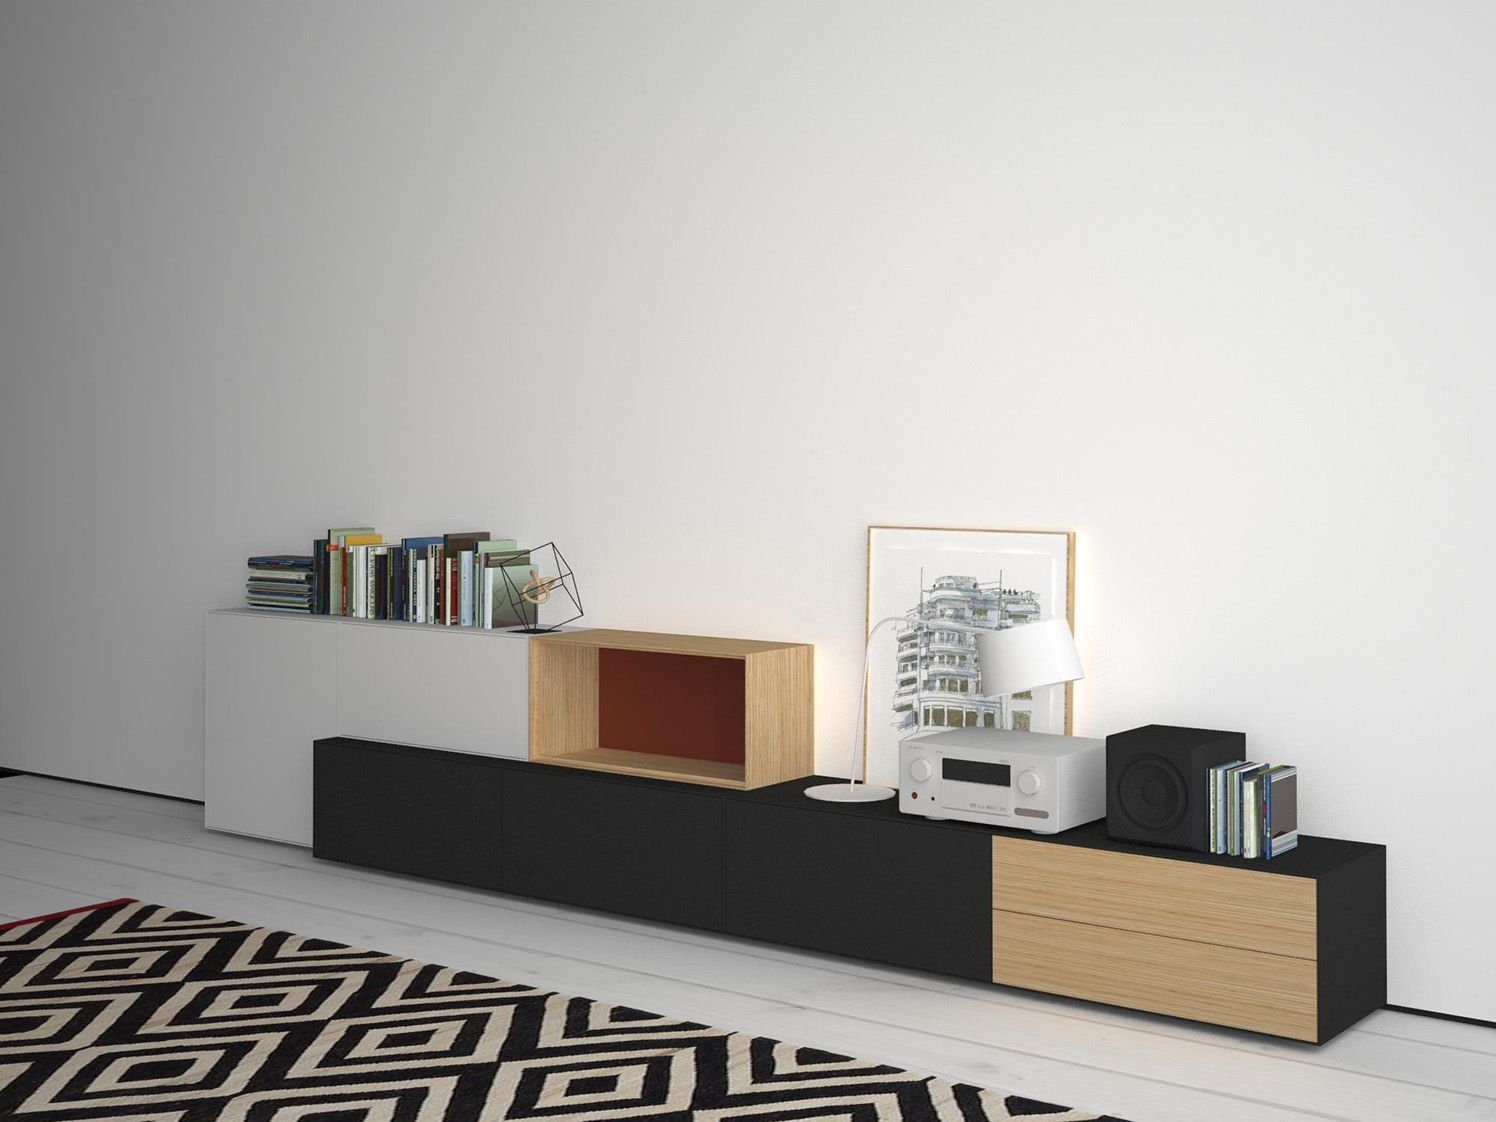 Http://www.treku.es/portfolio/muebles De